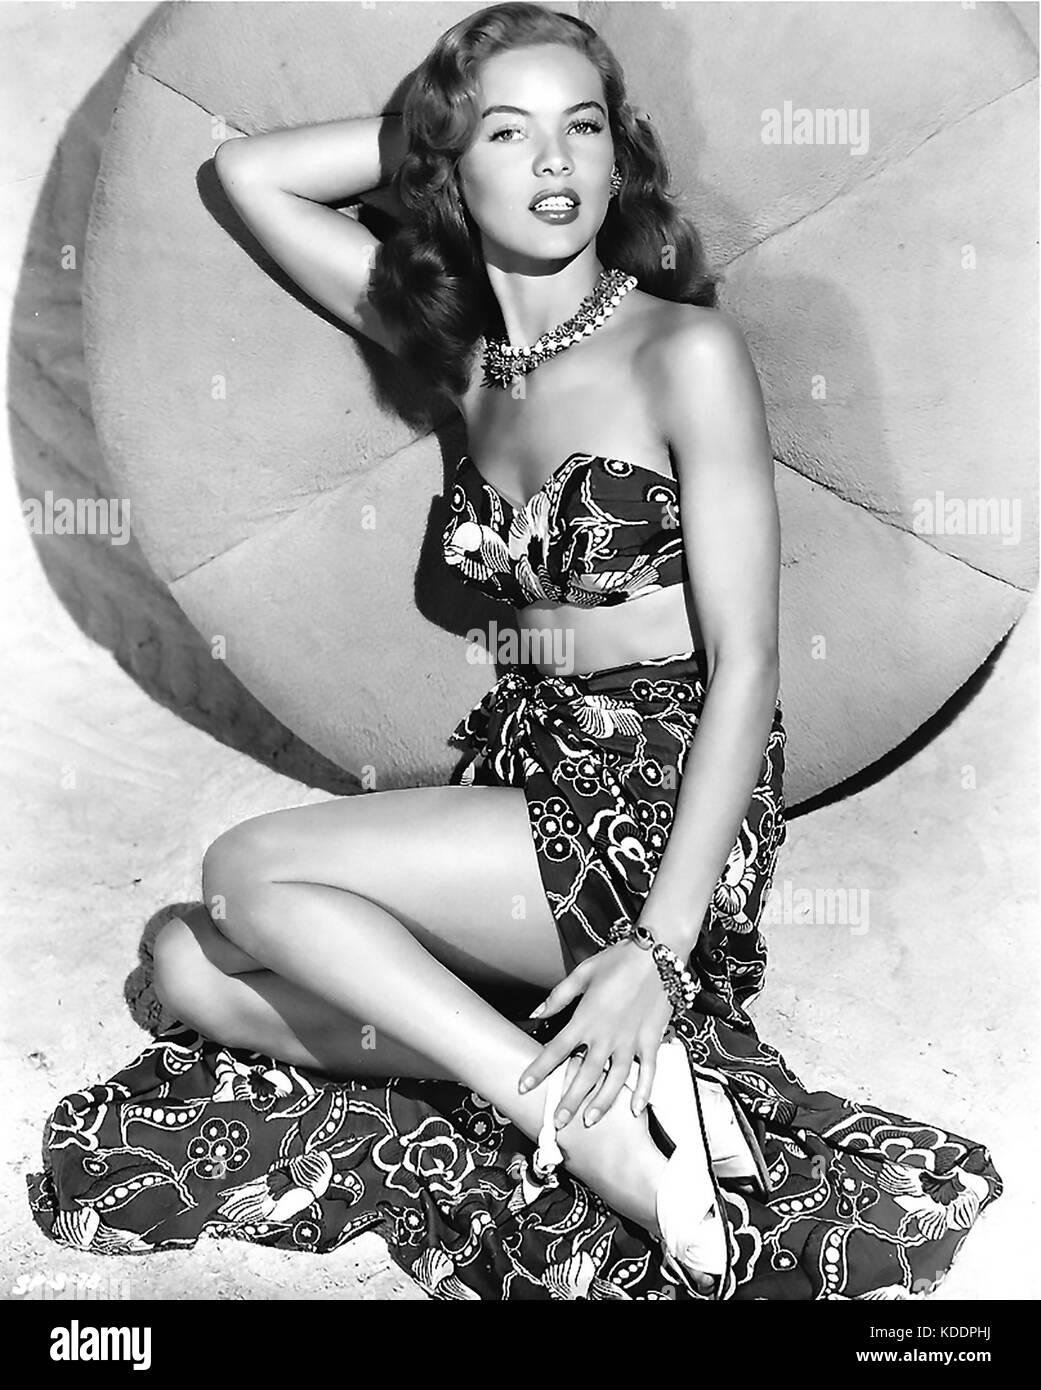 DONA DRAKE (1914-1989) American film actress and singer - Stock Image